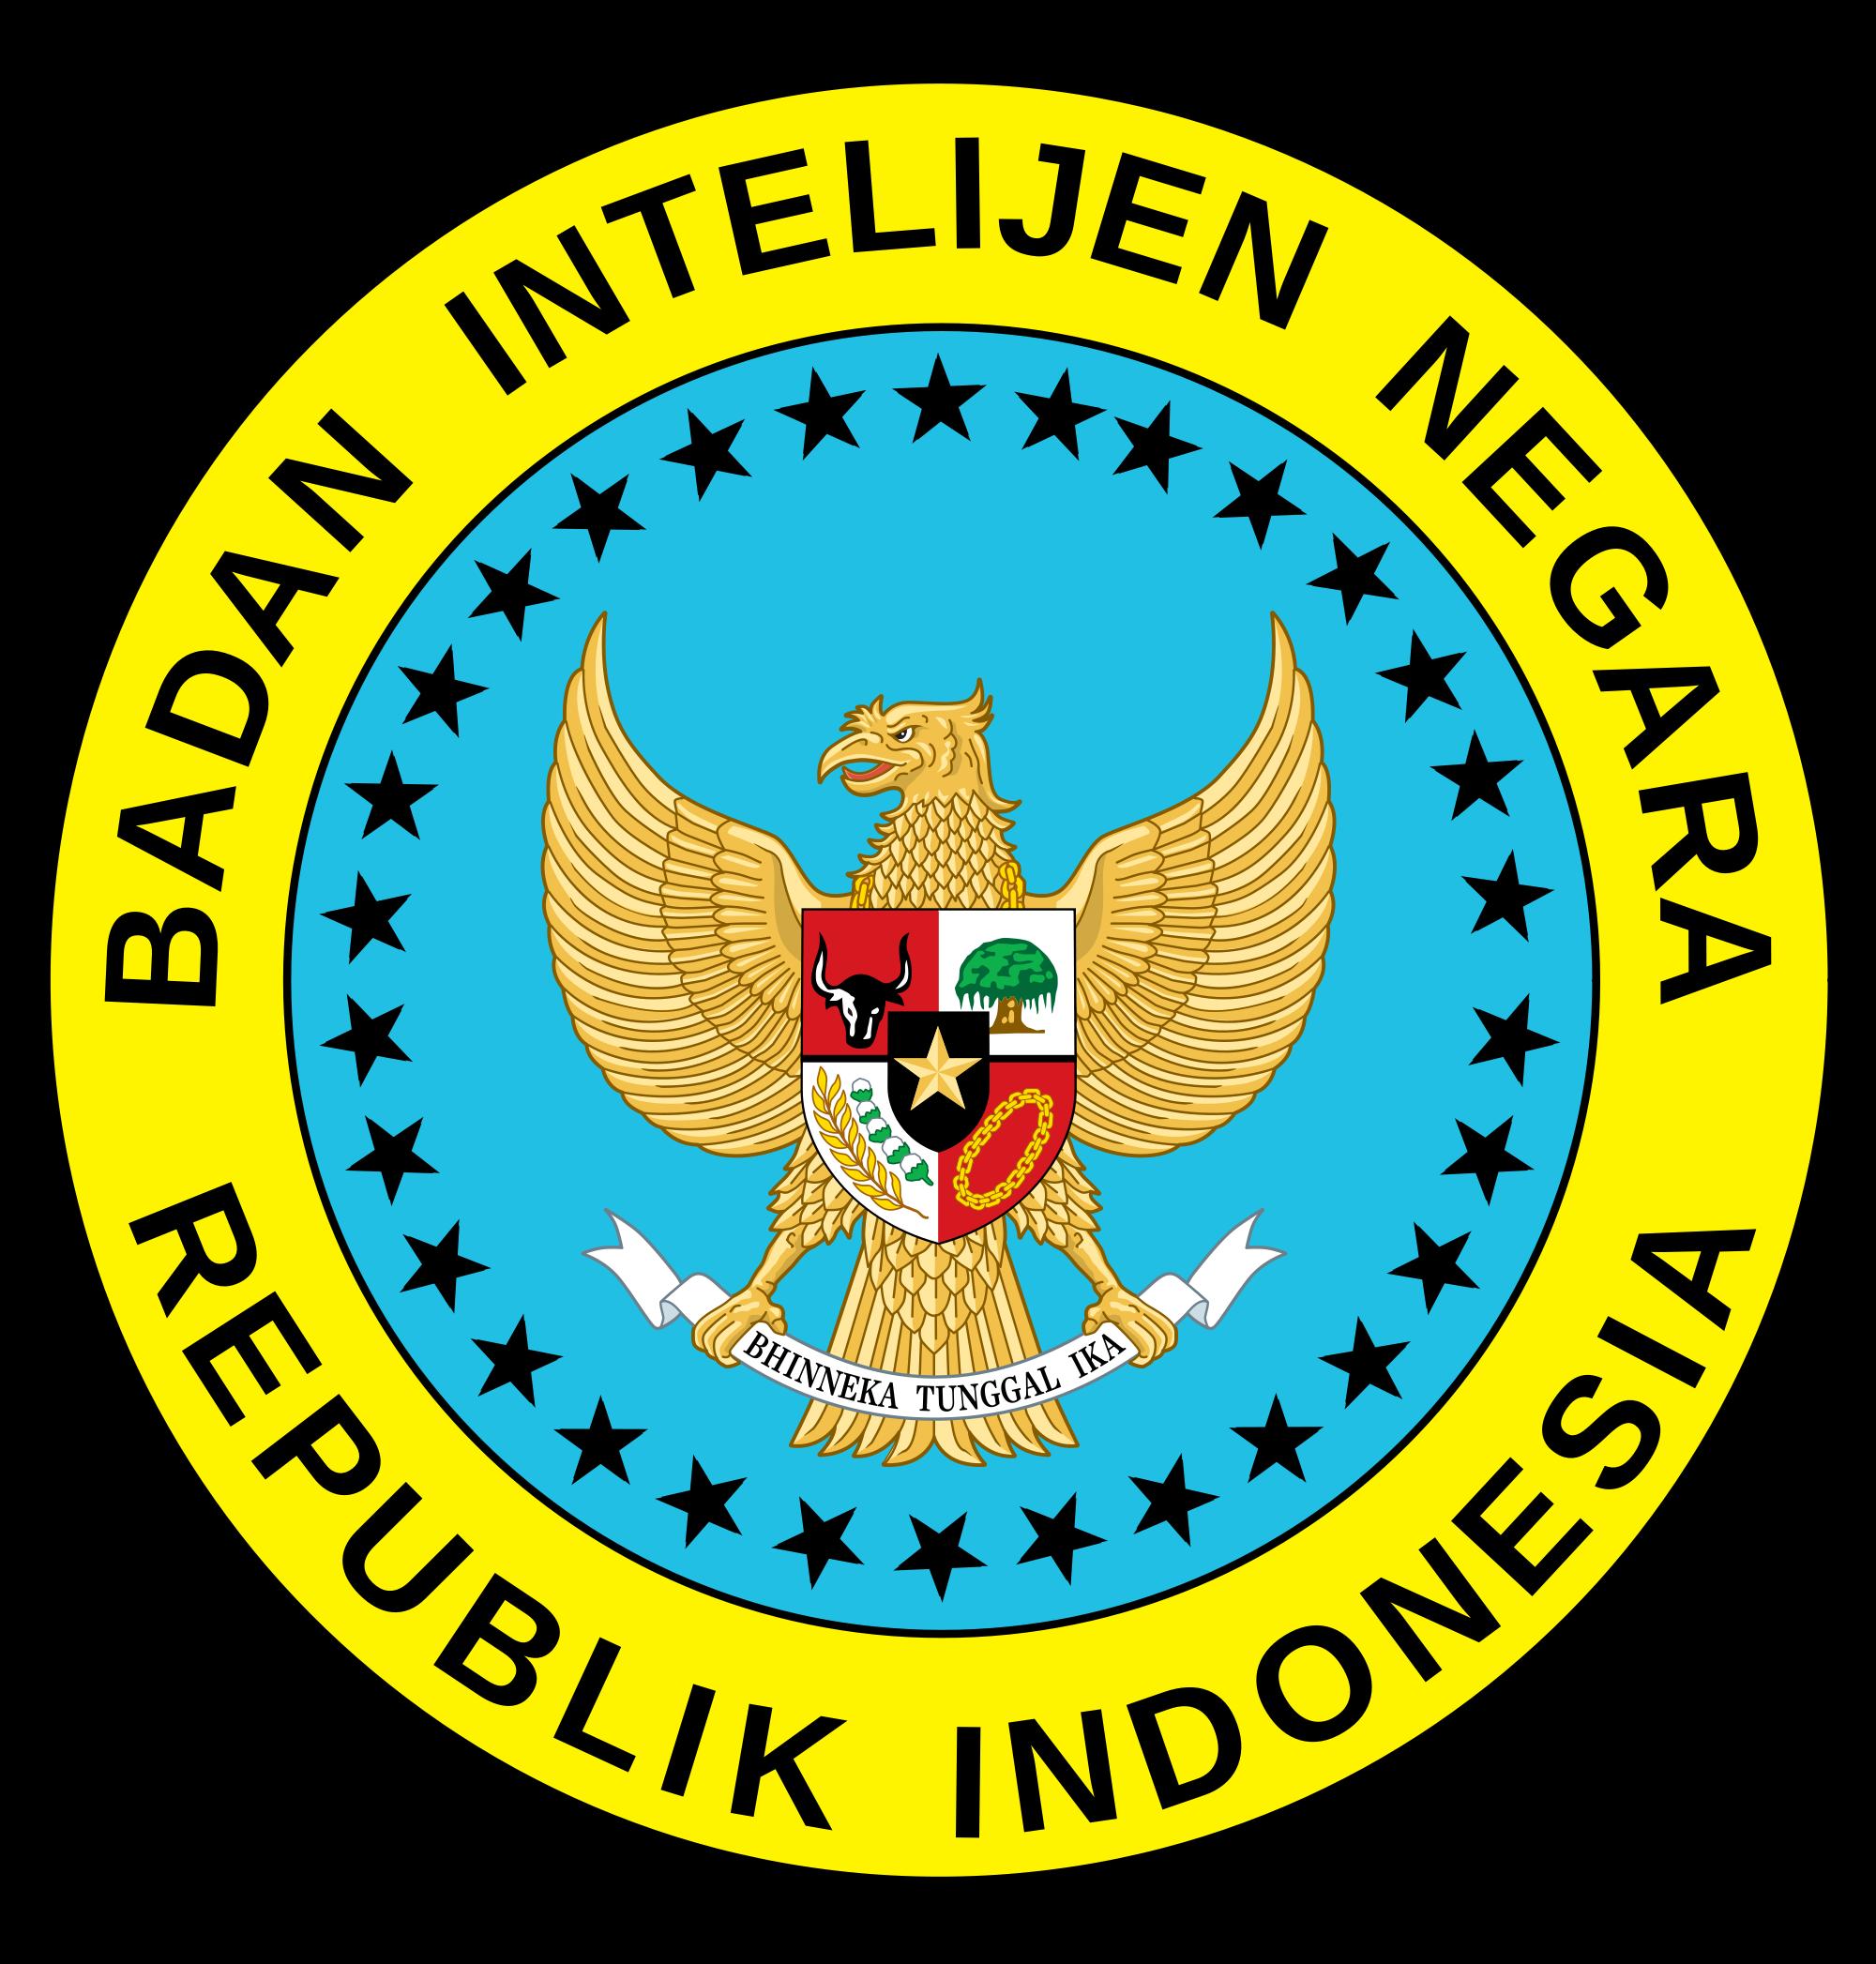 2000px The National Intelligence Agency Indonesia Svg Png 2000 2094 Lambang Negara Gambar Indonesia